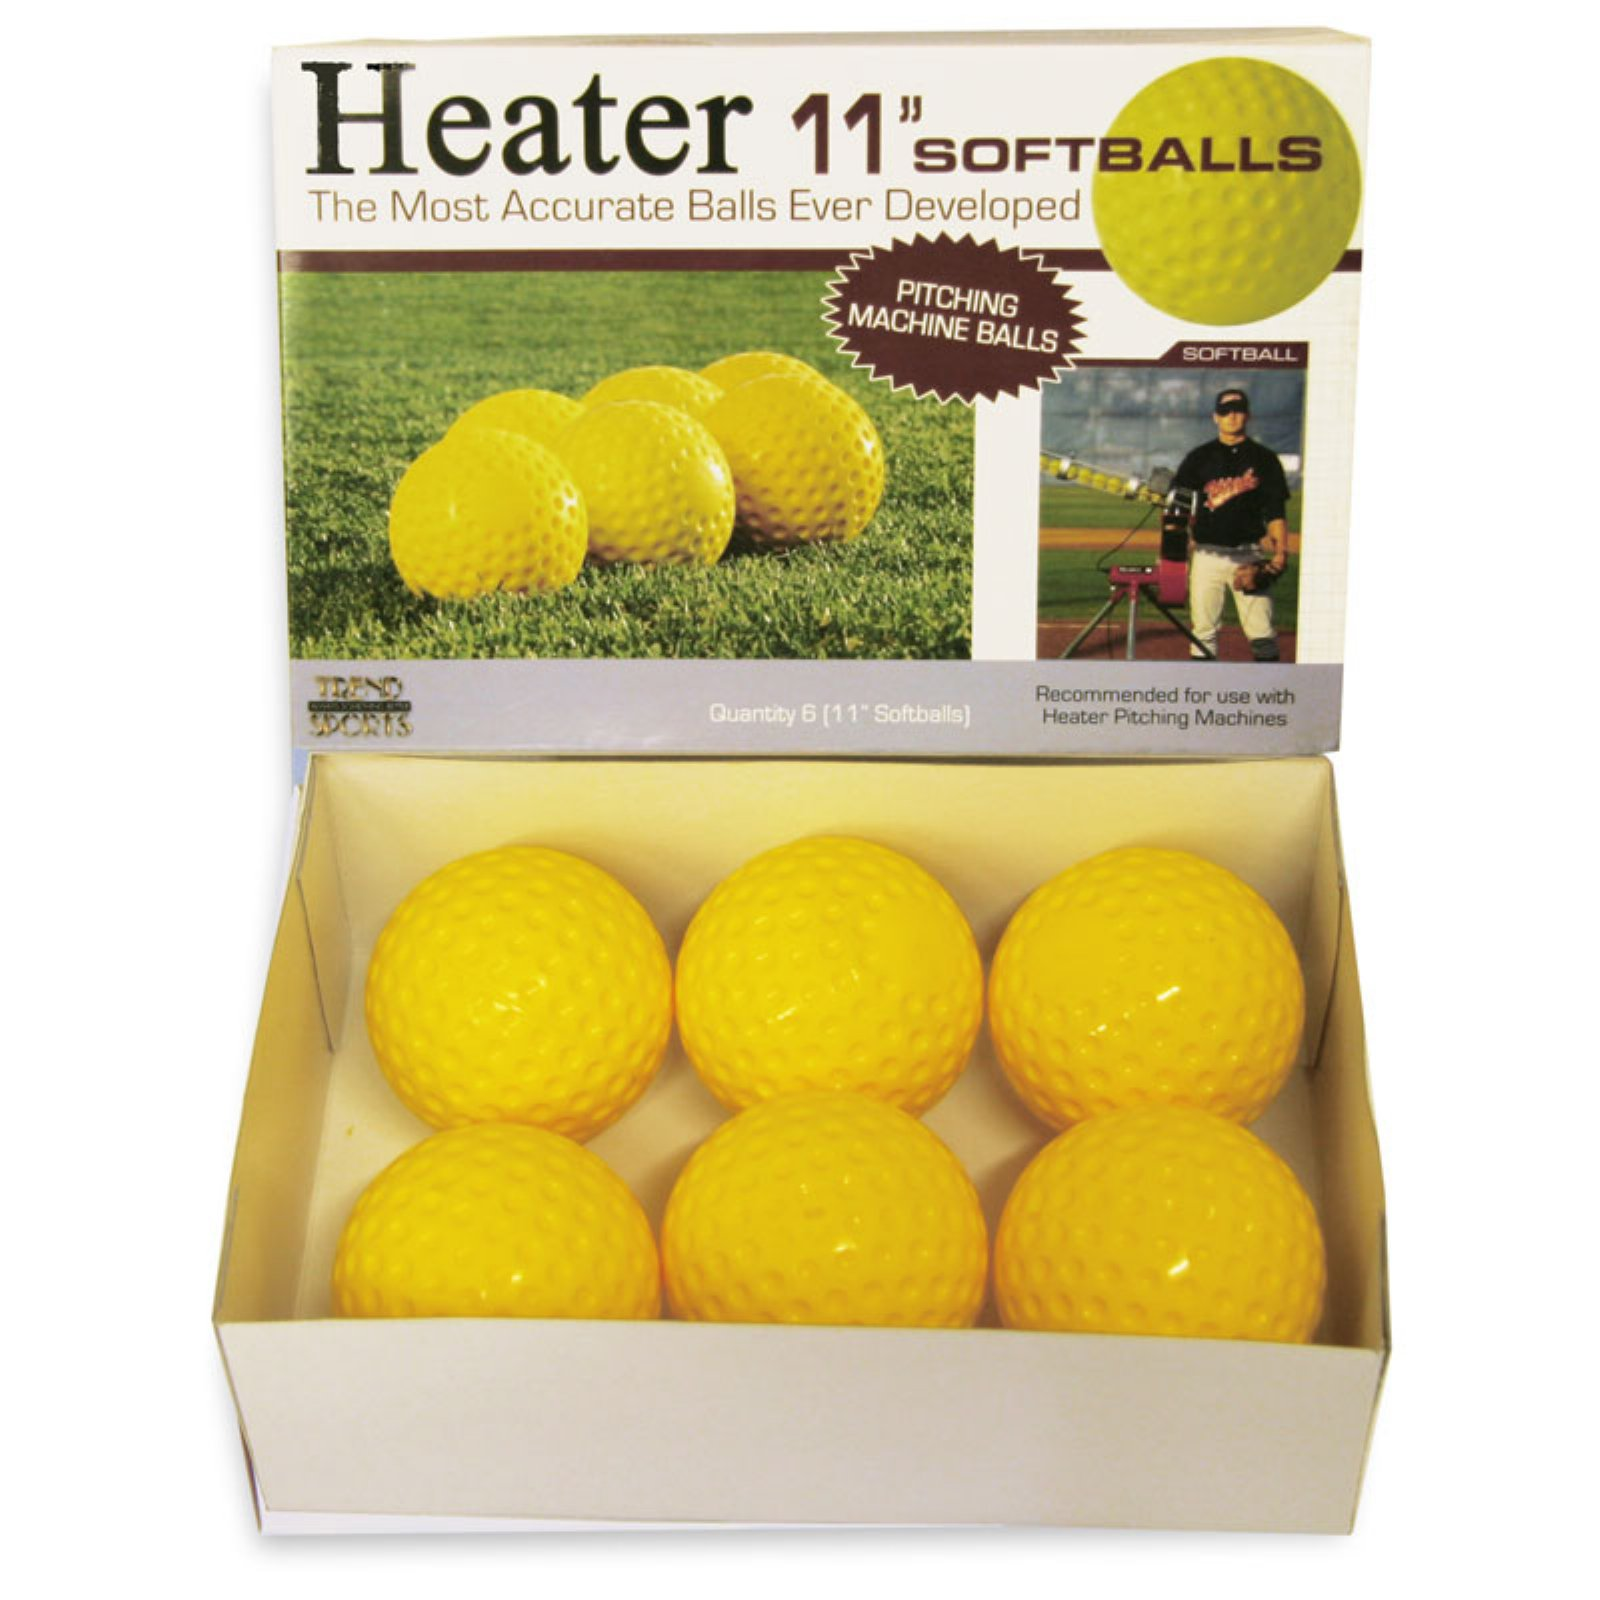 Heater Sports 11 in. Pitching Machine Softballs 1 Dozen by World Sports Products Inc